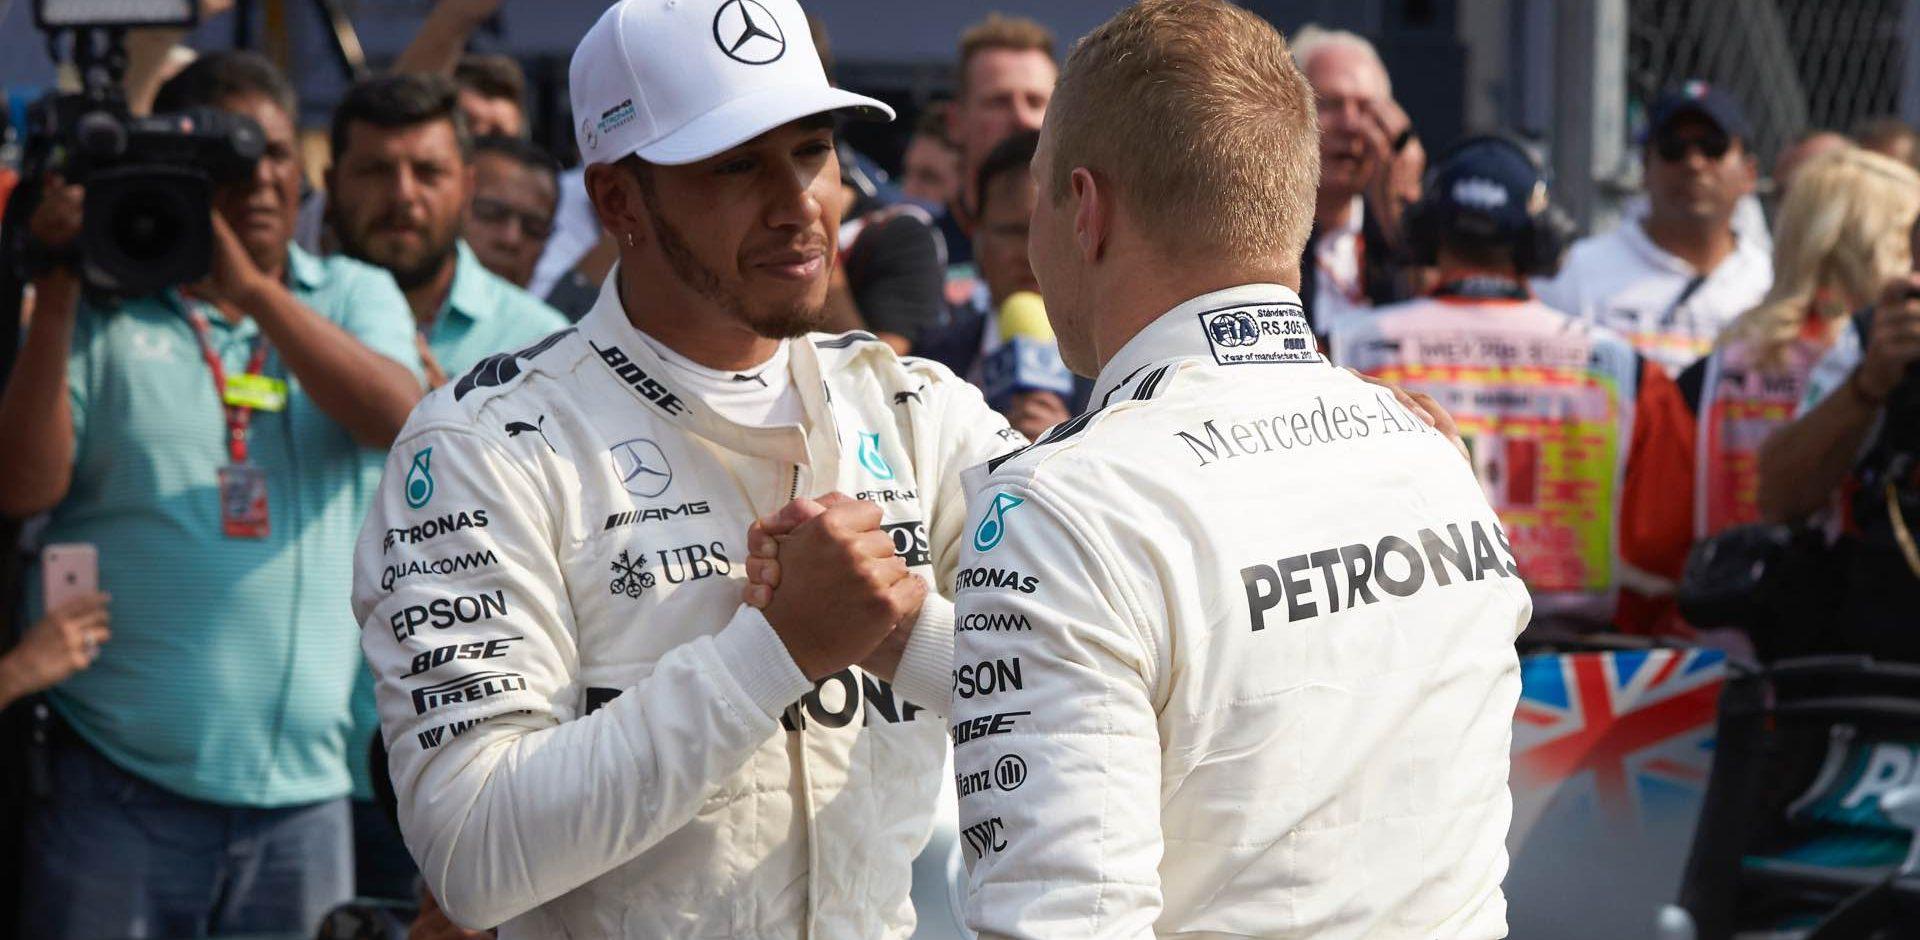 Fotó: Mercedes AMG Petronas Motorsport